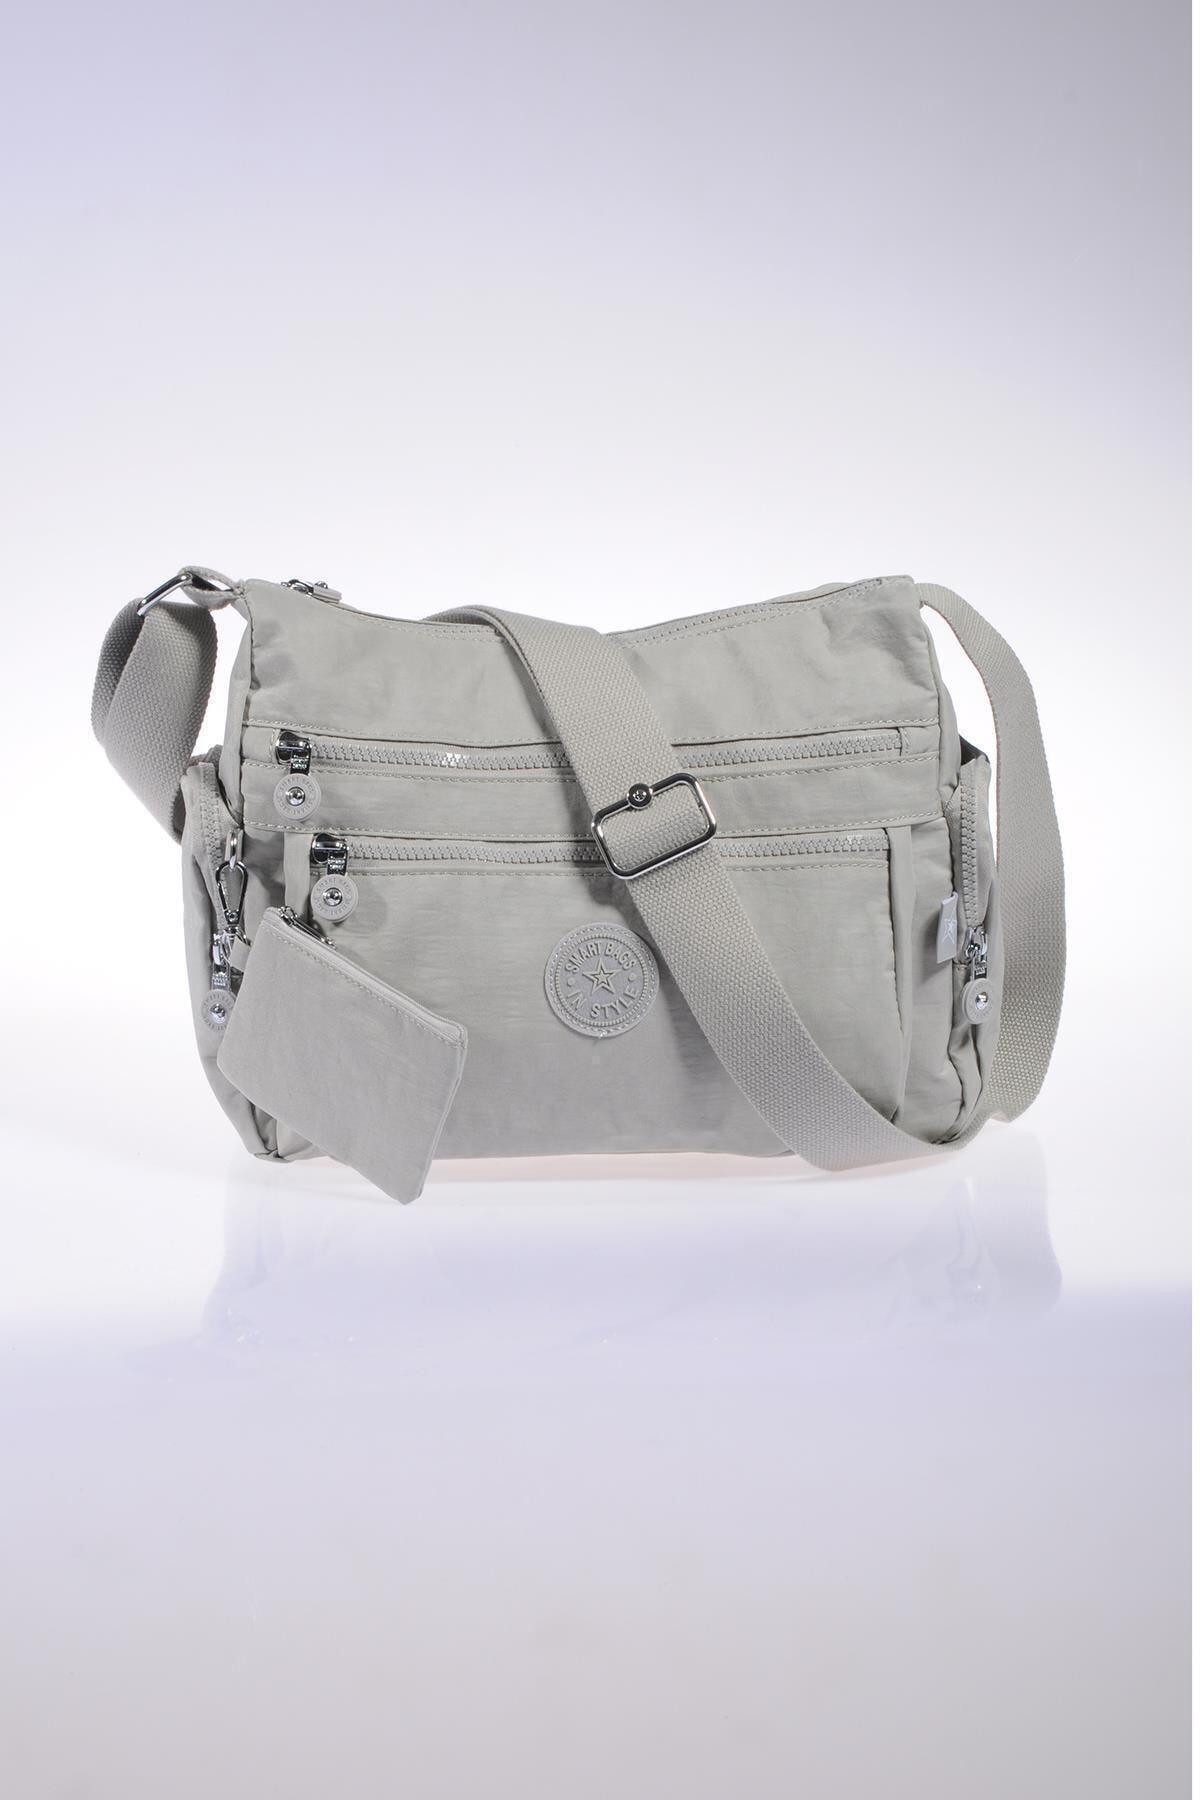 SMART BAGS Smb1115-0083 Ice Gri Kadın Çapraz Çanta 1